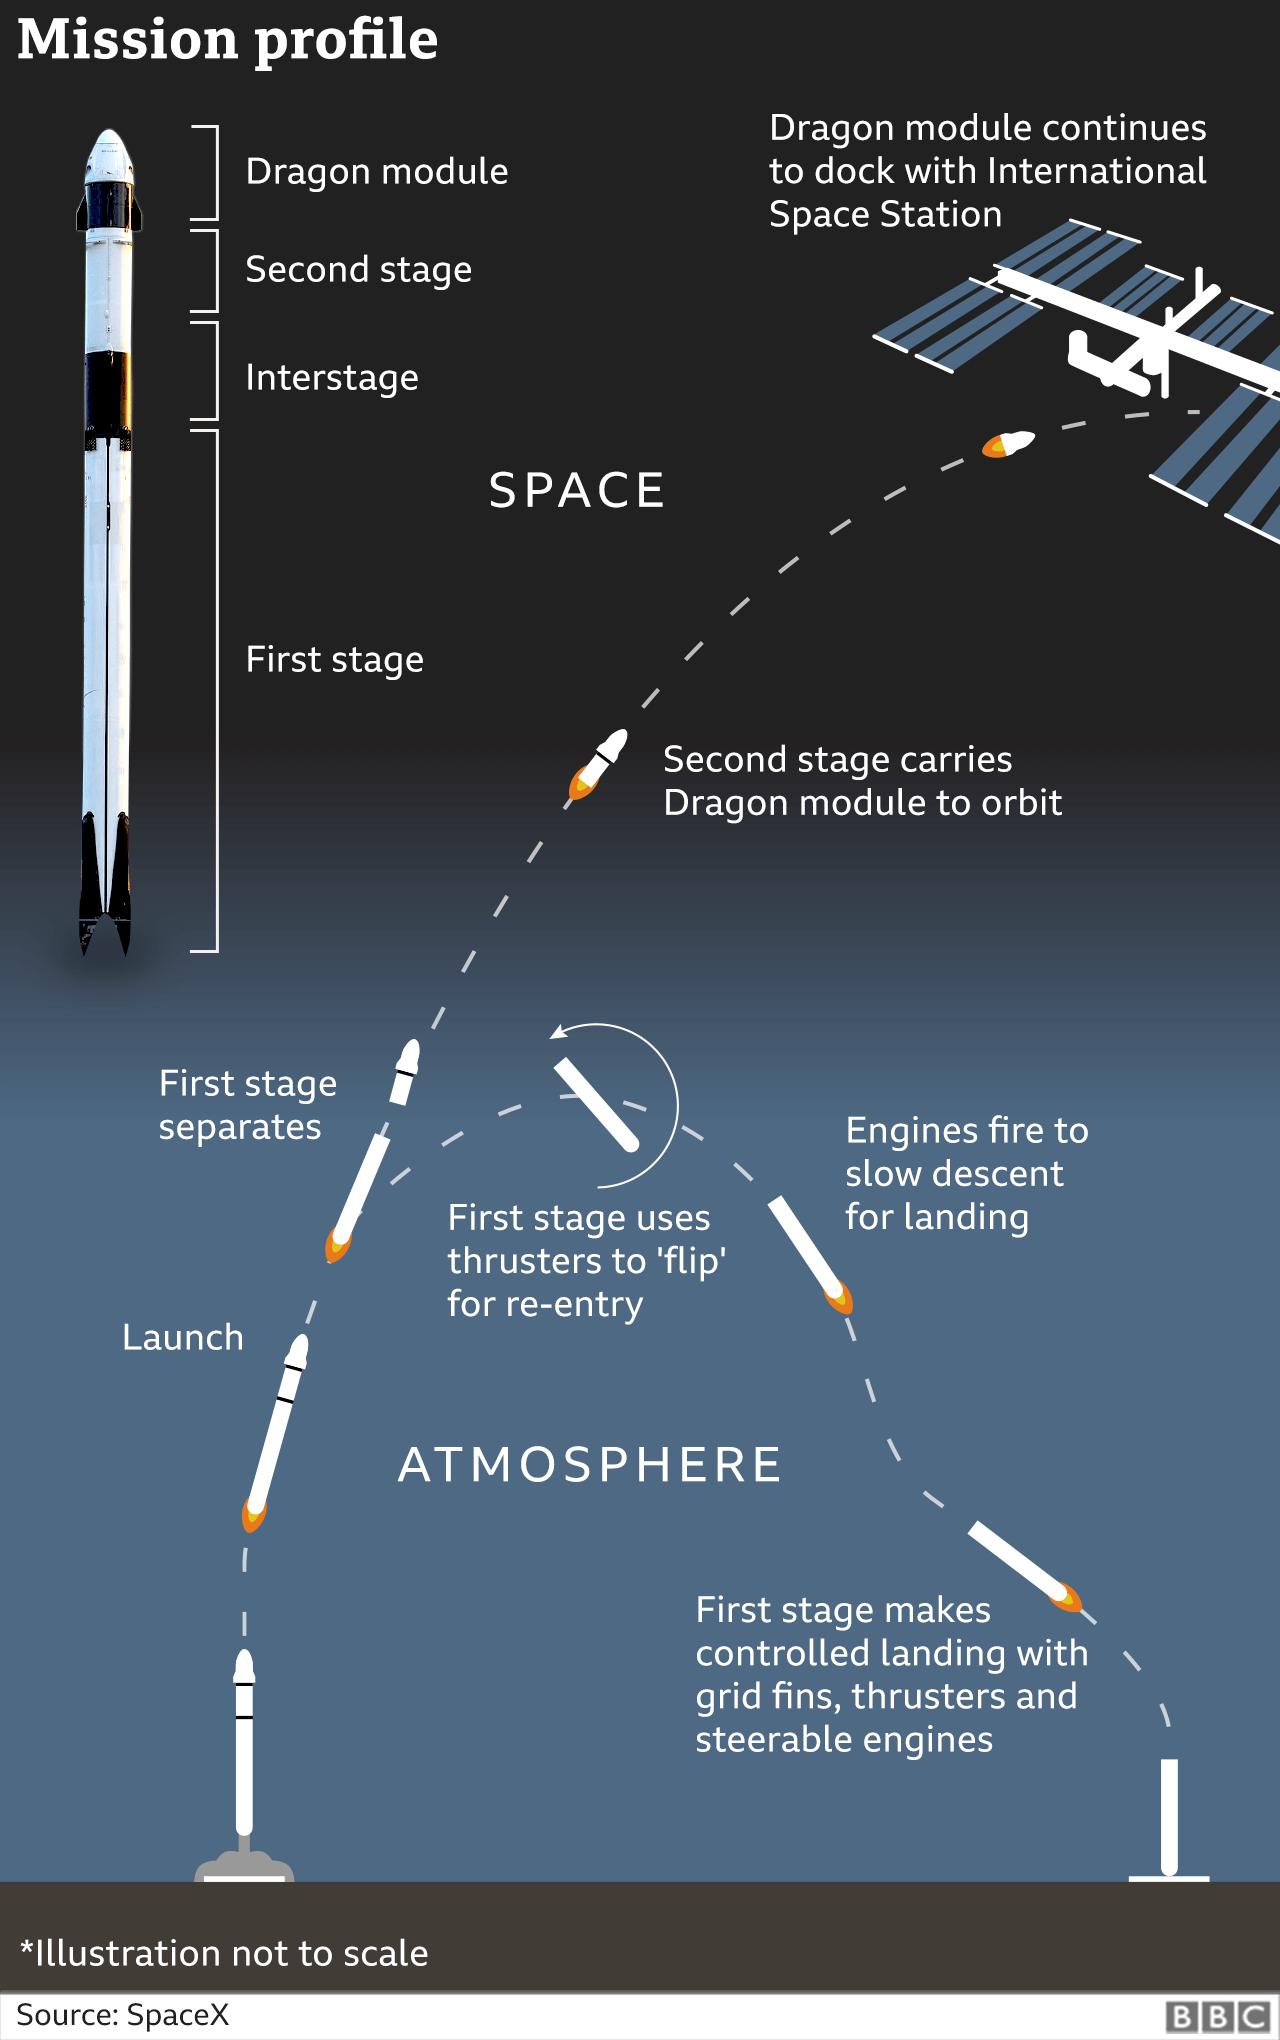 _112424555_space_x_dragon_mission_profil